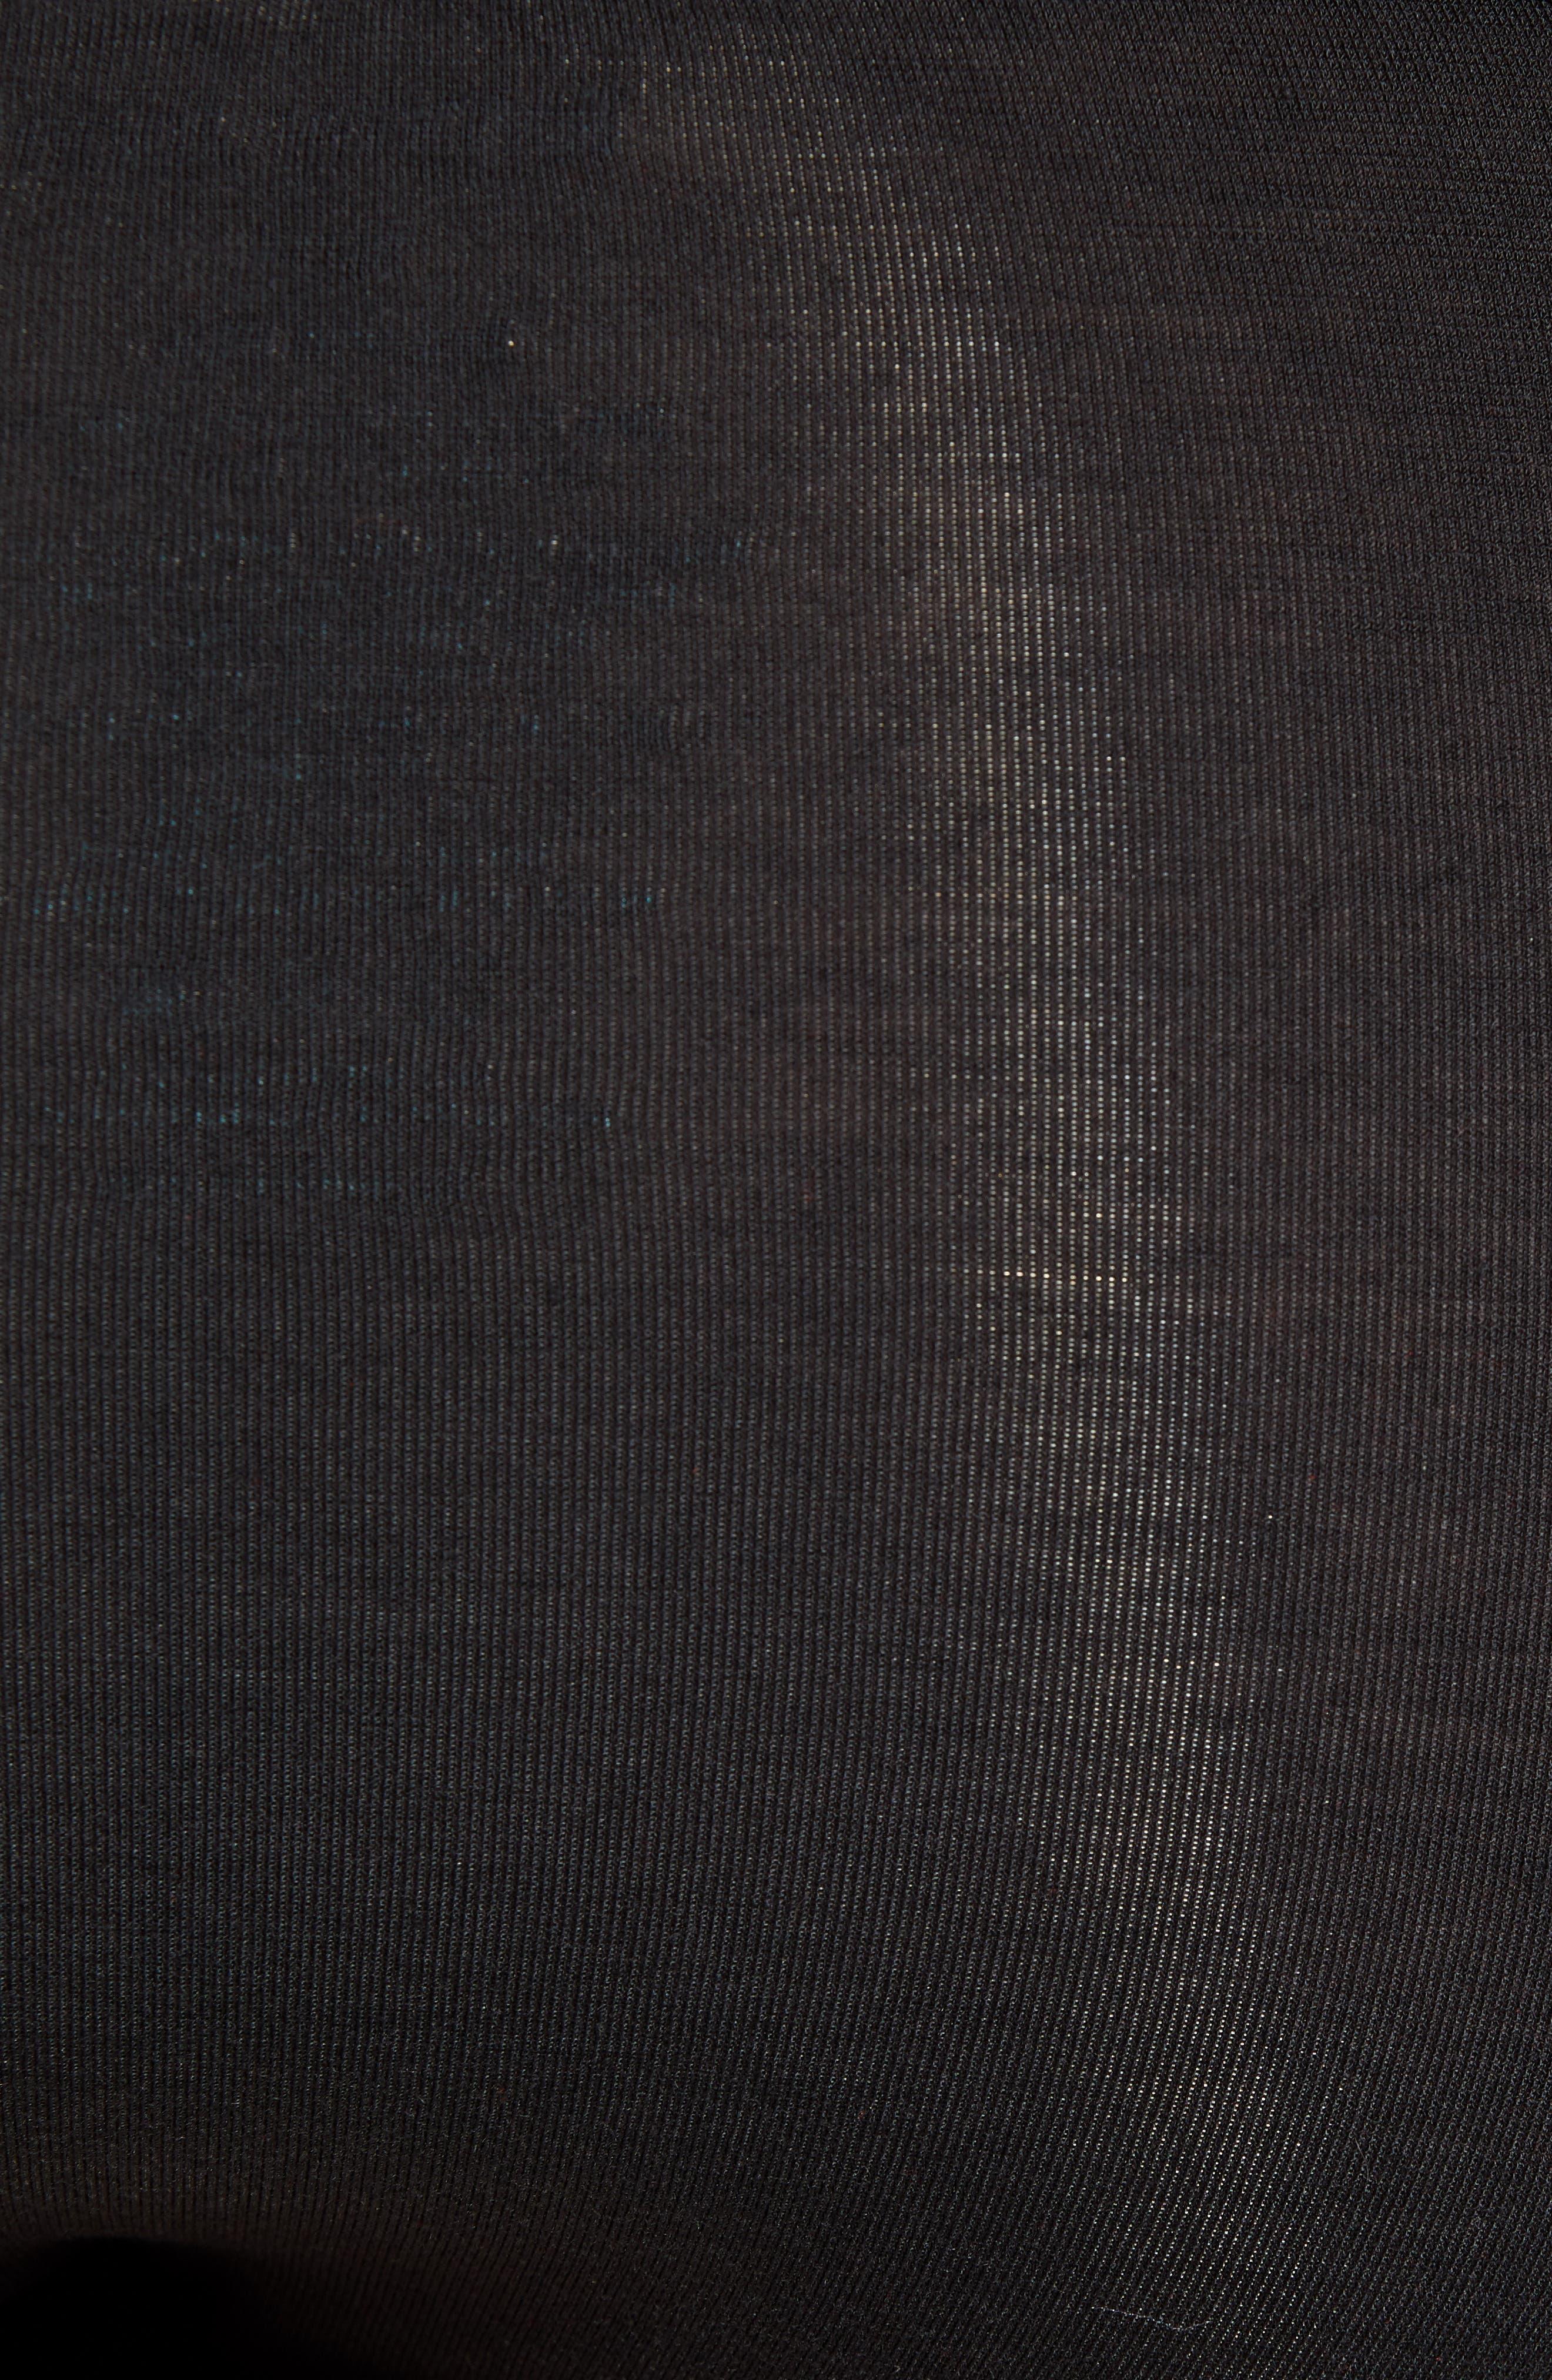 TOMMY JOHN, Second Skin Gunmetal Briefs, Alternate thumbnail 5, color, BLACK